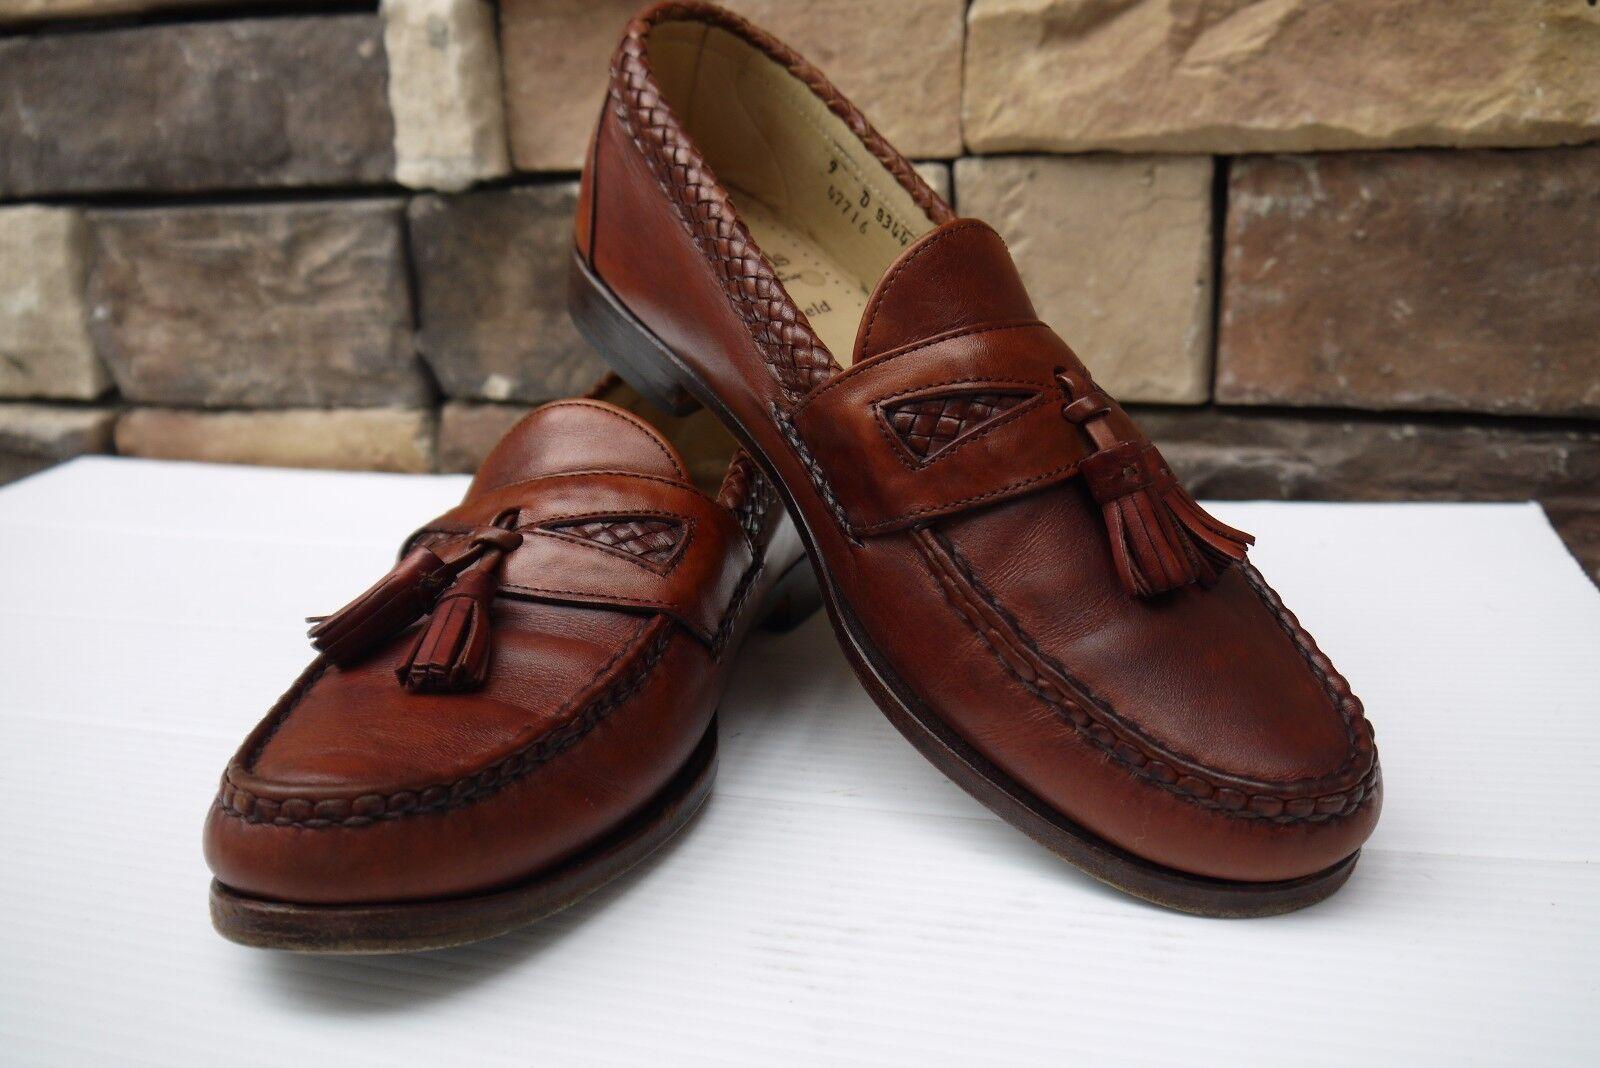 Allen Edmonds Men's Maxfield Tassel Loafer CHILI US 9 D  MUST HAVE